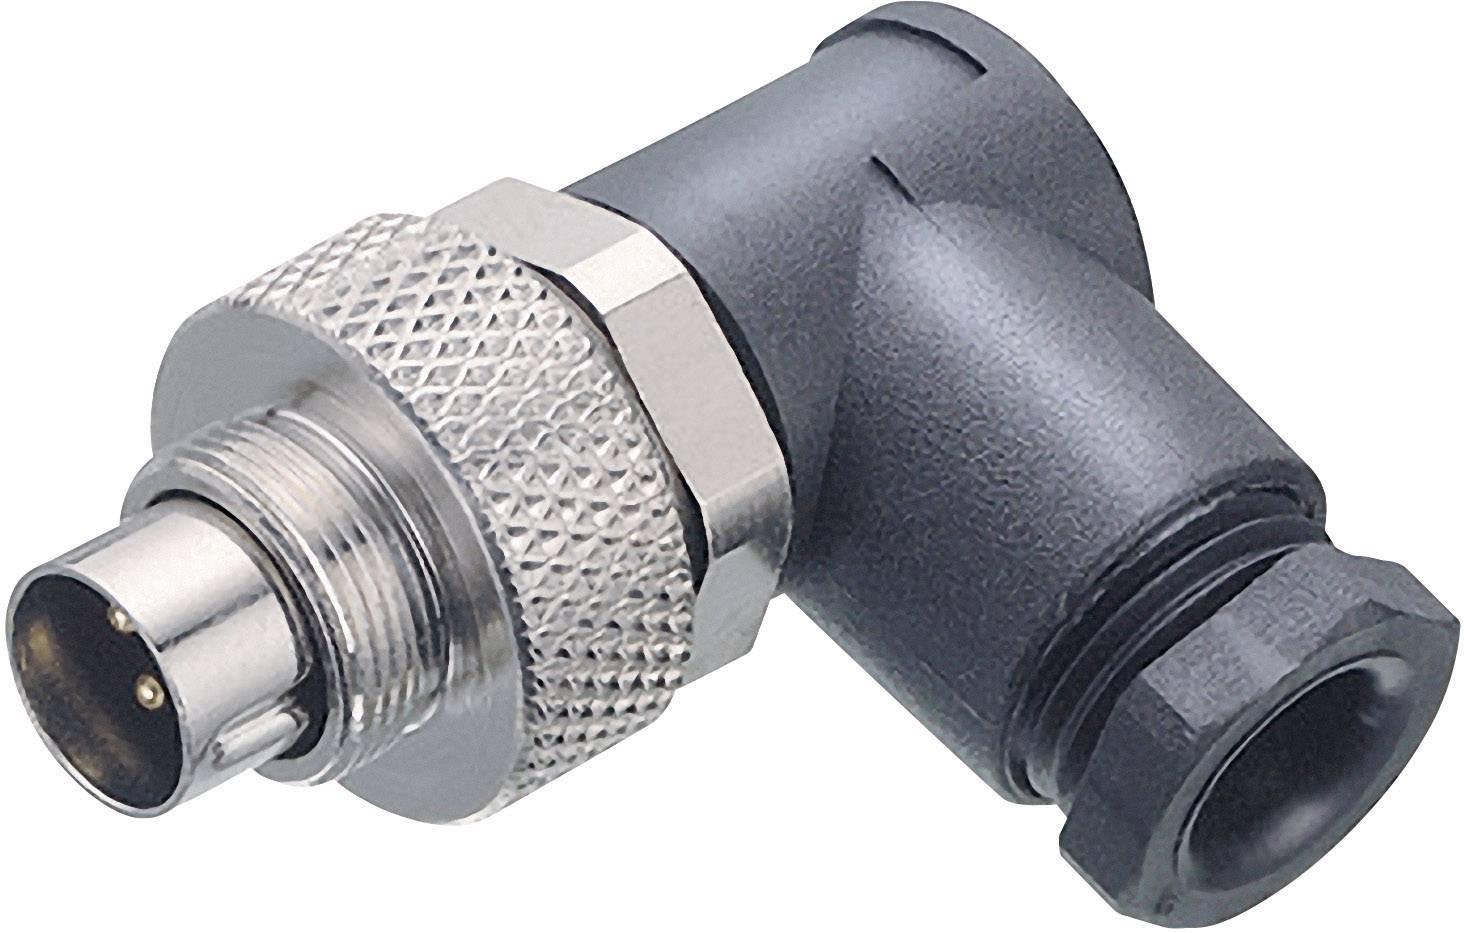 Guľatý konektor submin. Binder 99-0425-70-08, 8-pól., uhlová zástrčka, 3,5 - 5 mm, IP67